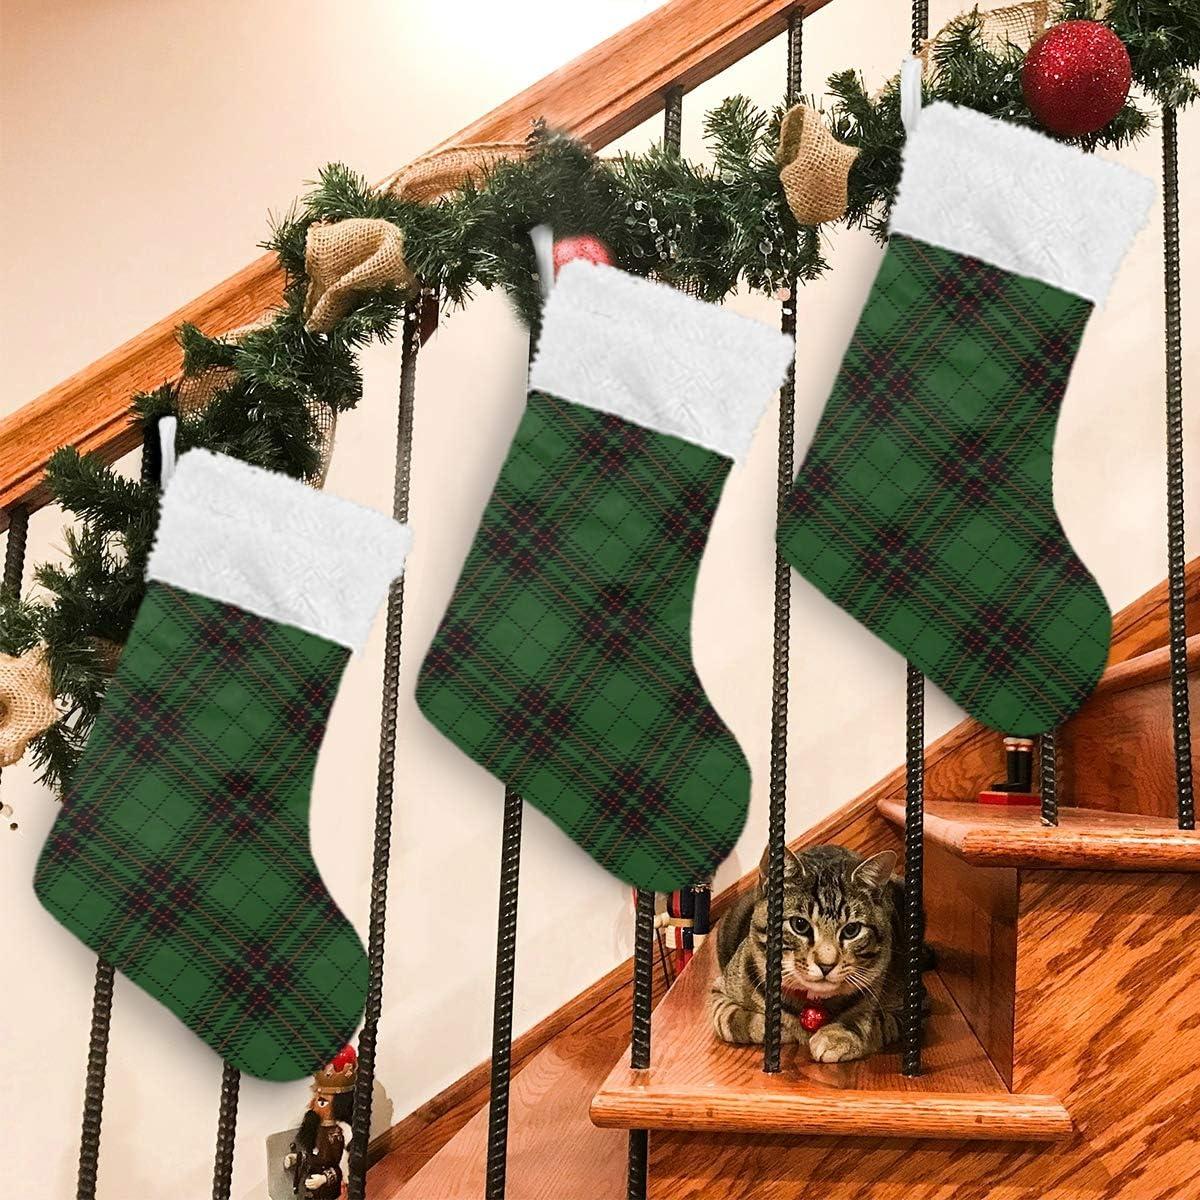 Christmas Stockings Green Buffalo Plaid White Black Max 85% OFF Award-winning store Plush Checks